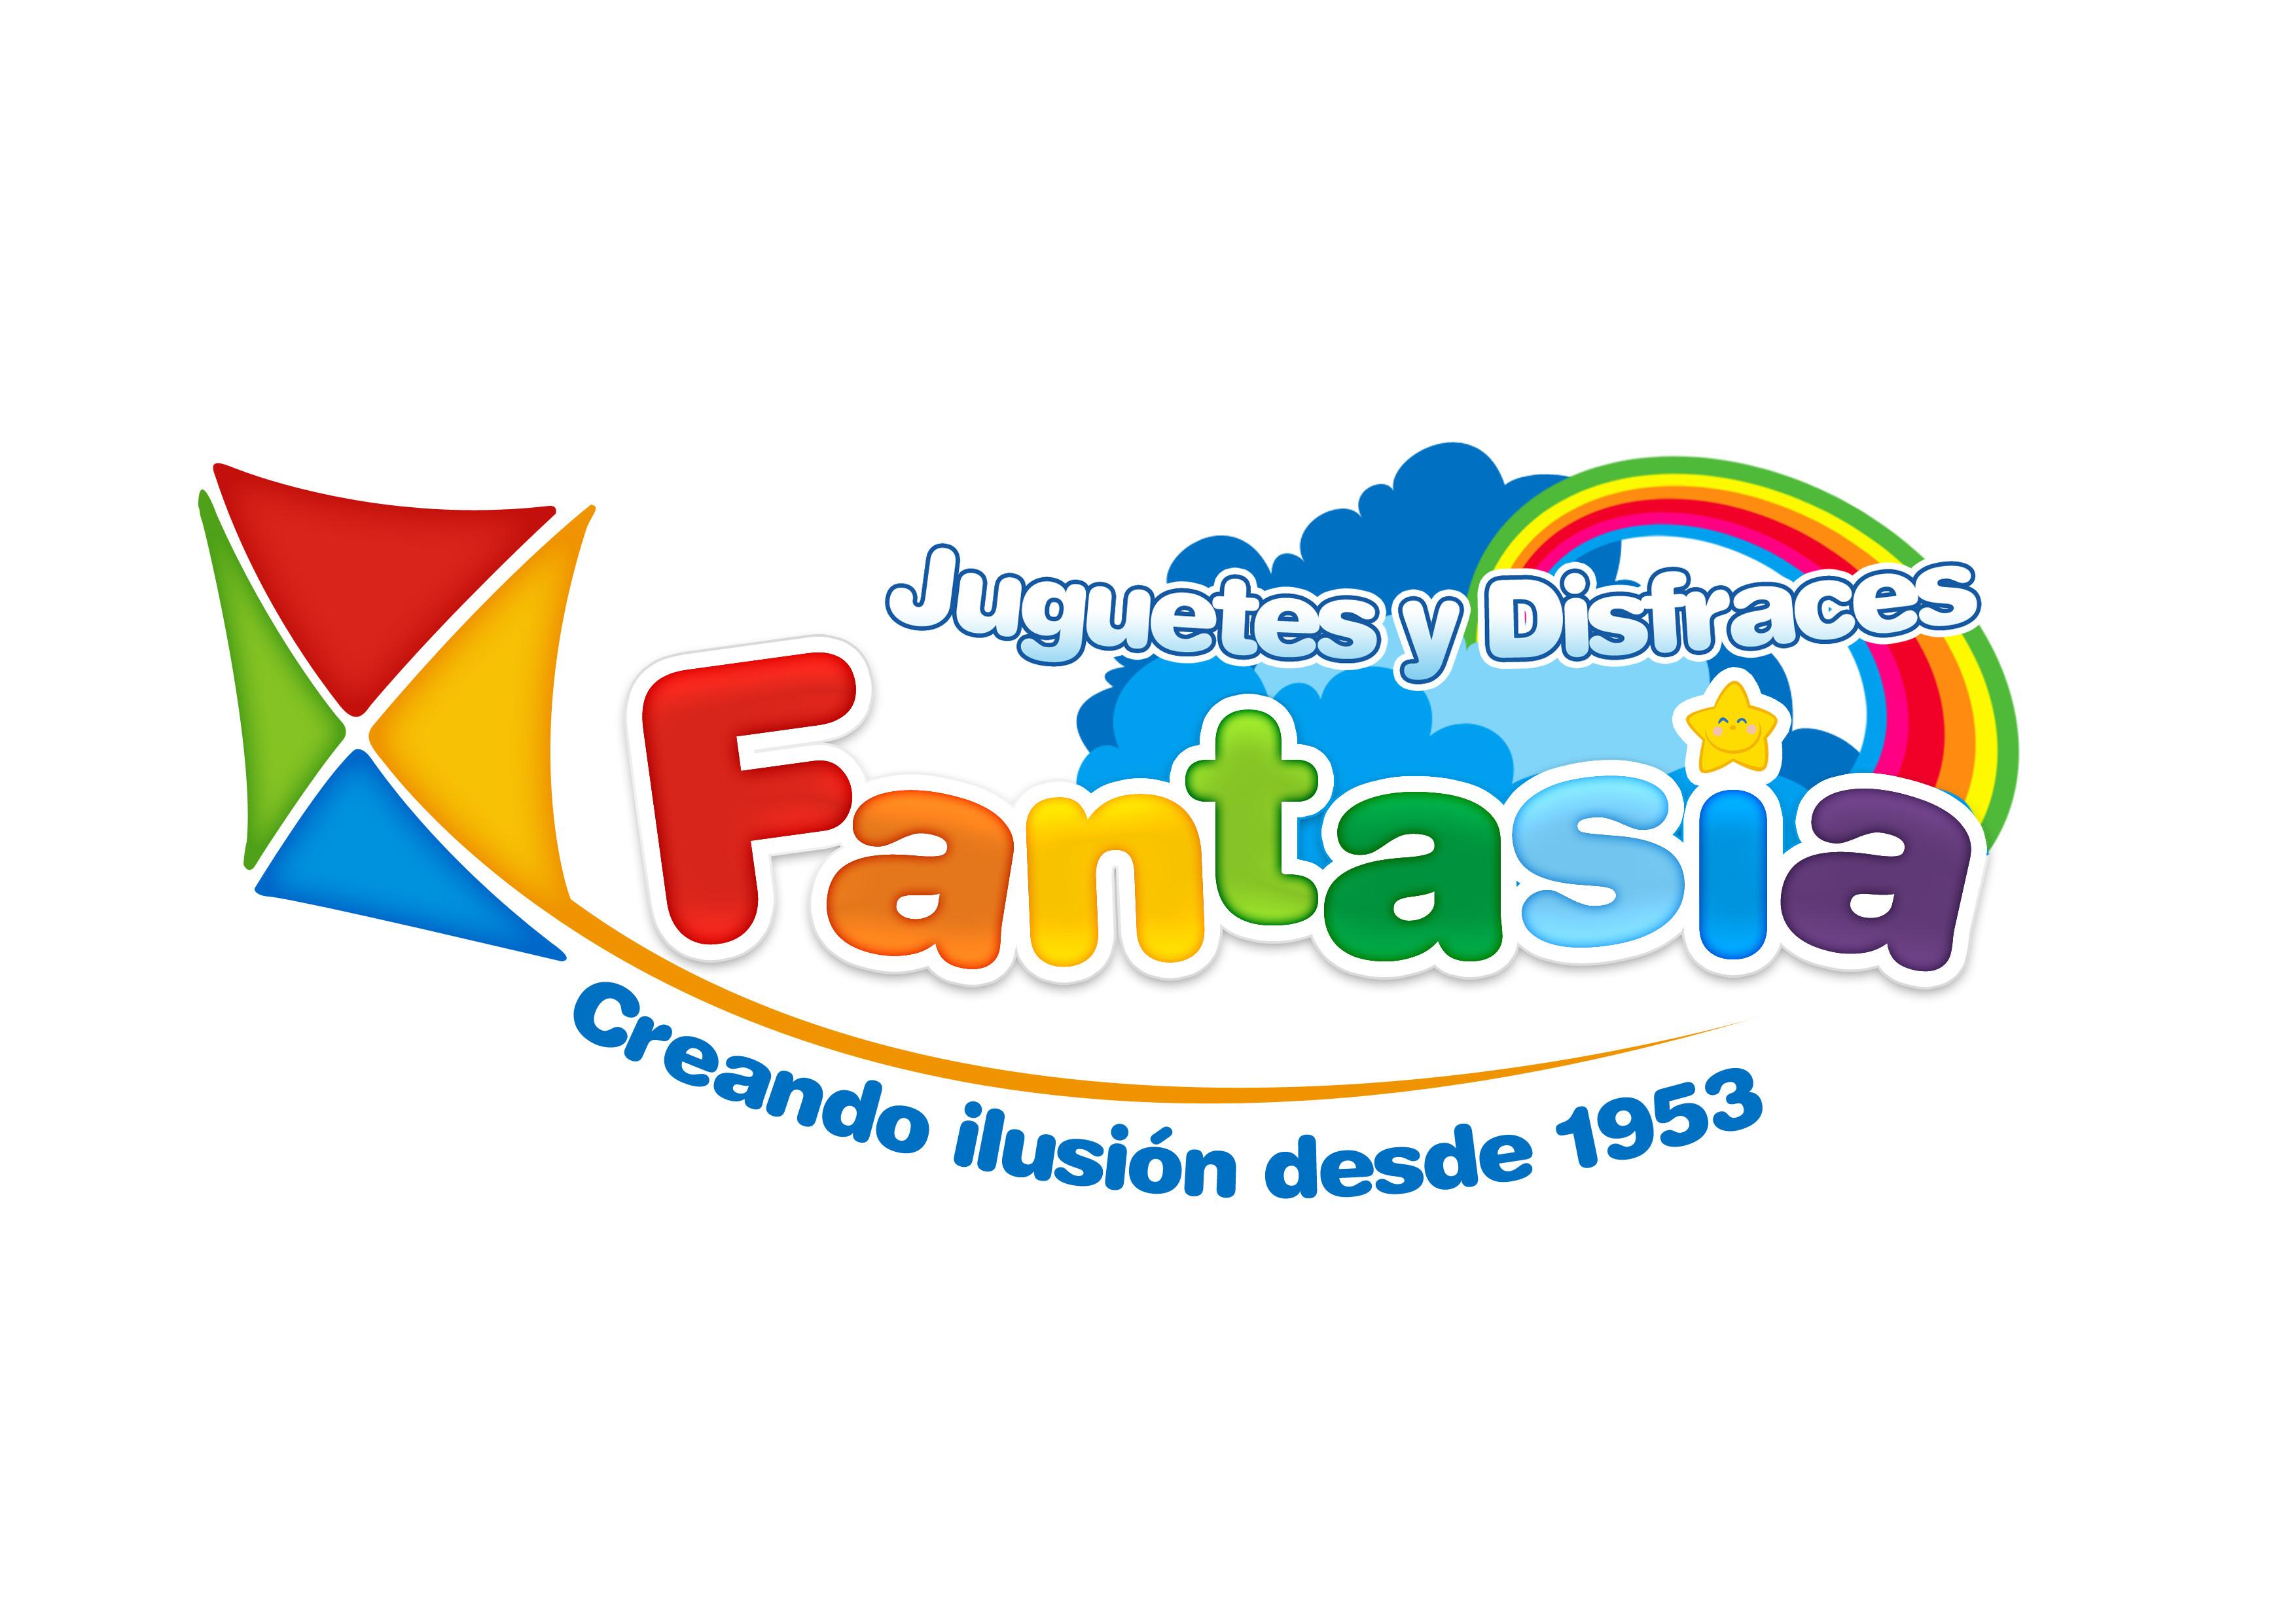 JUGUETES FANTASIA